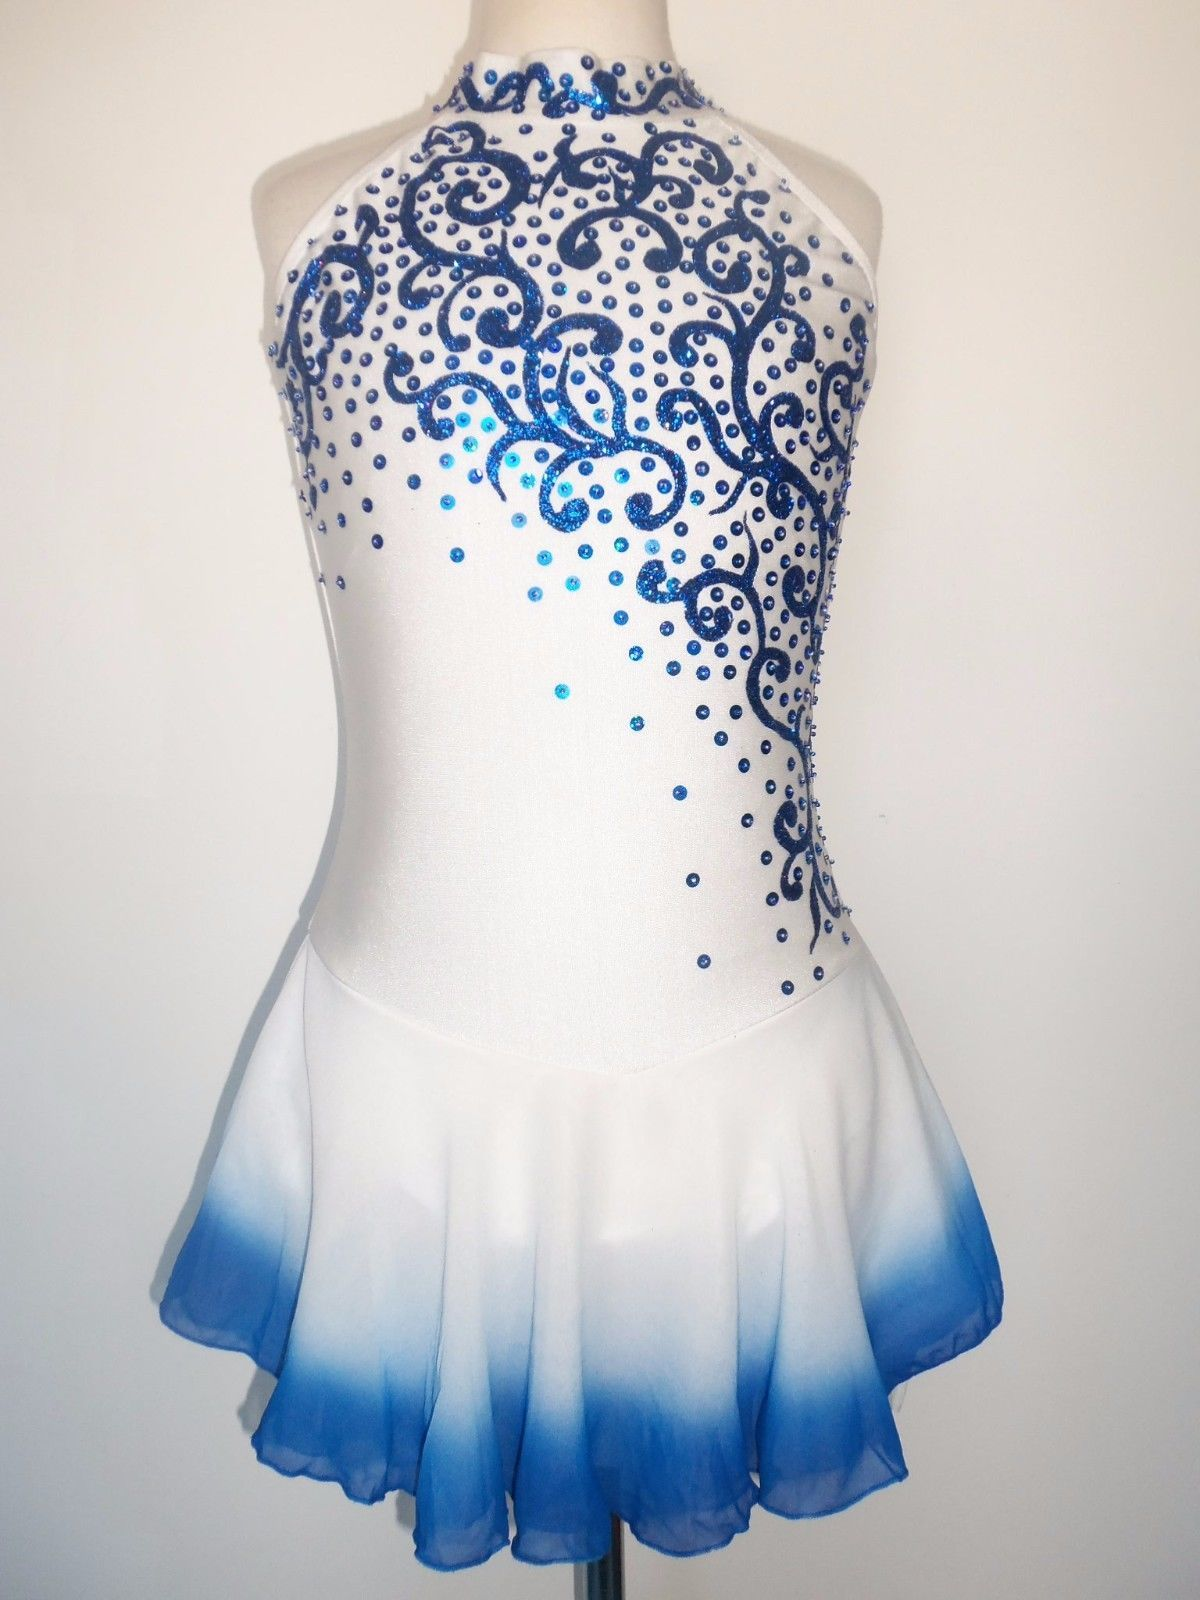 SALE NEW FIGURE ICE SKATING BATON TWIRLING DRESS COSTUME GIRL XL